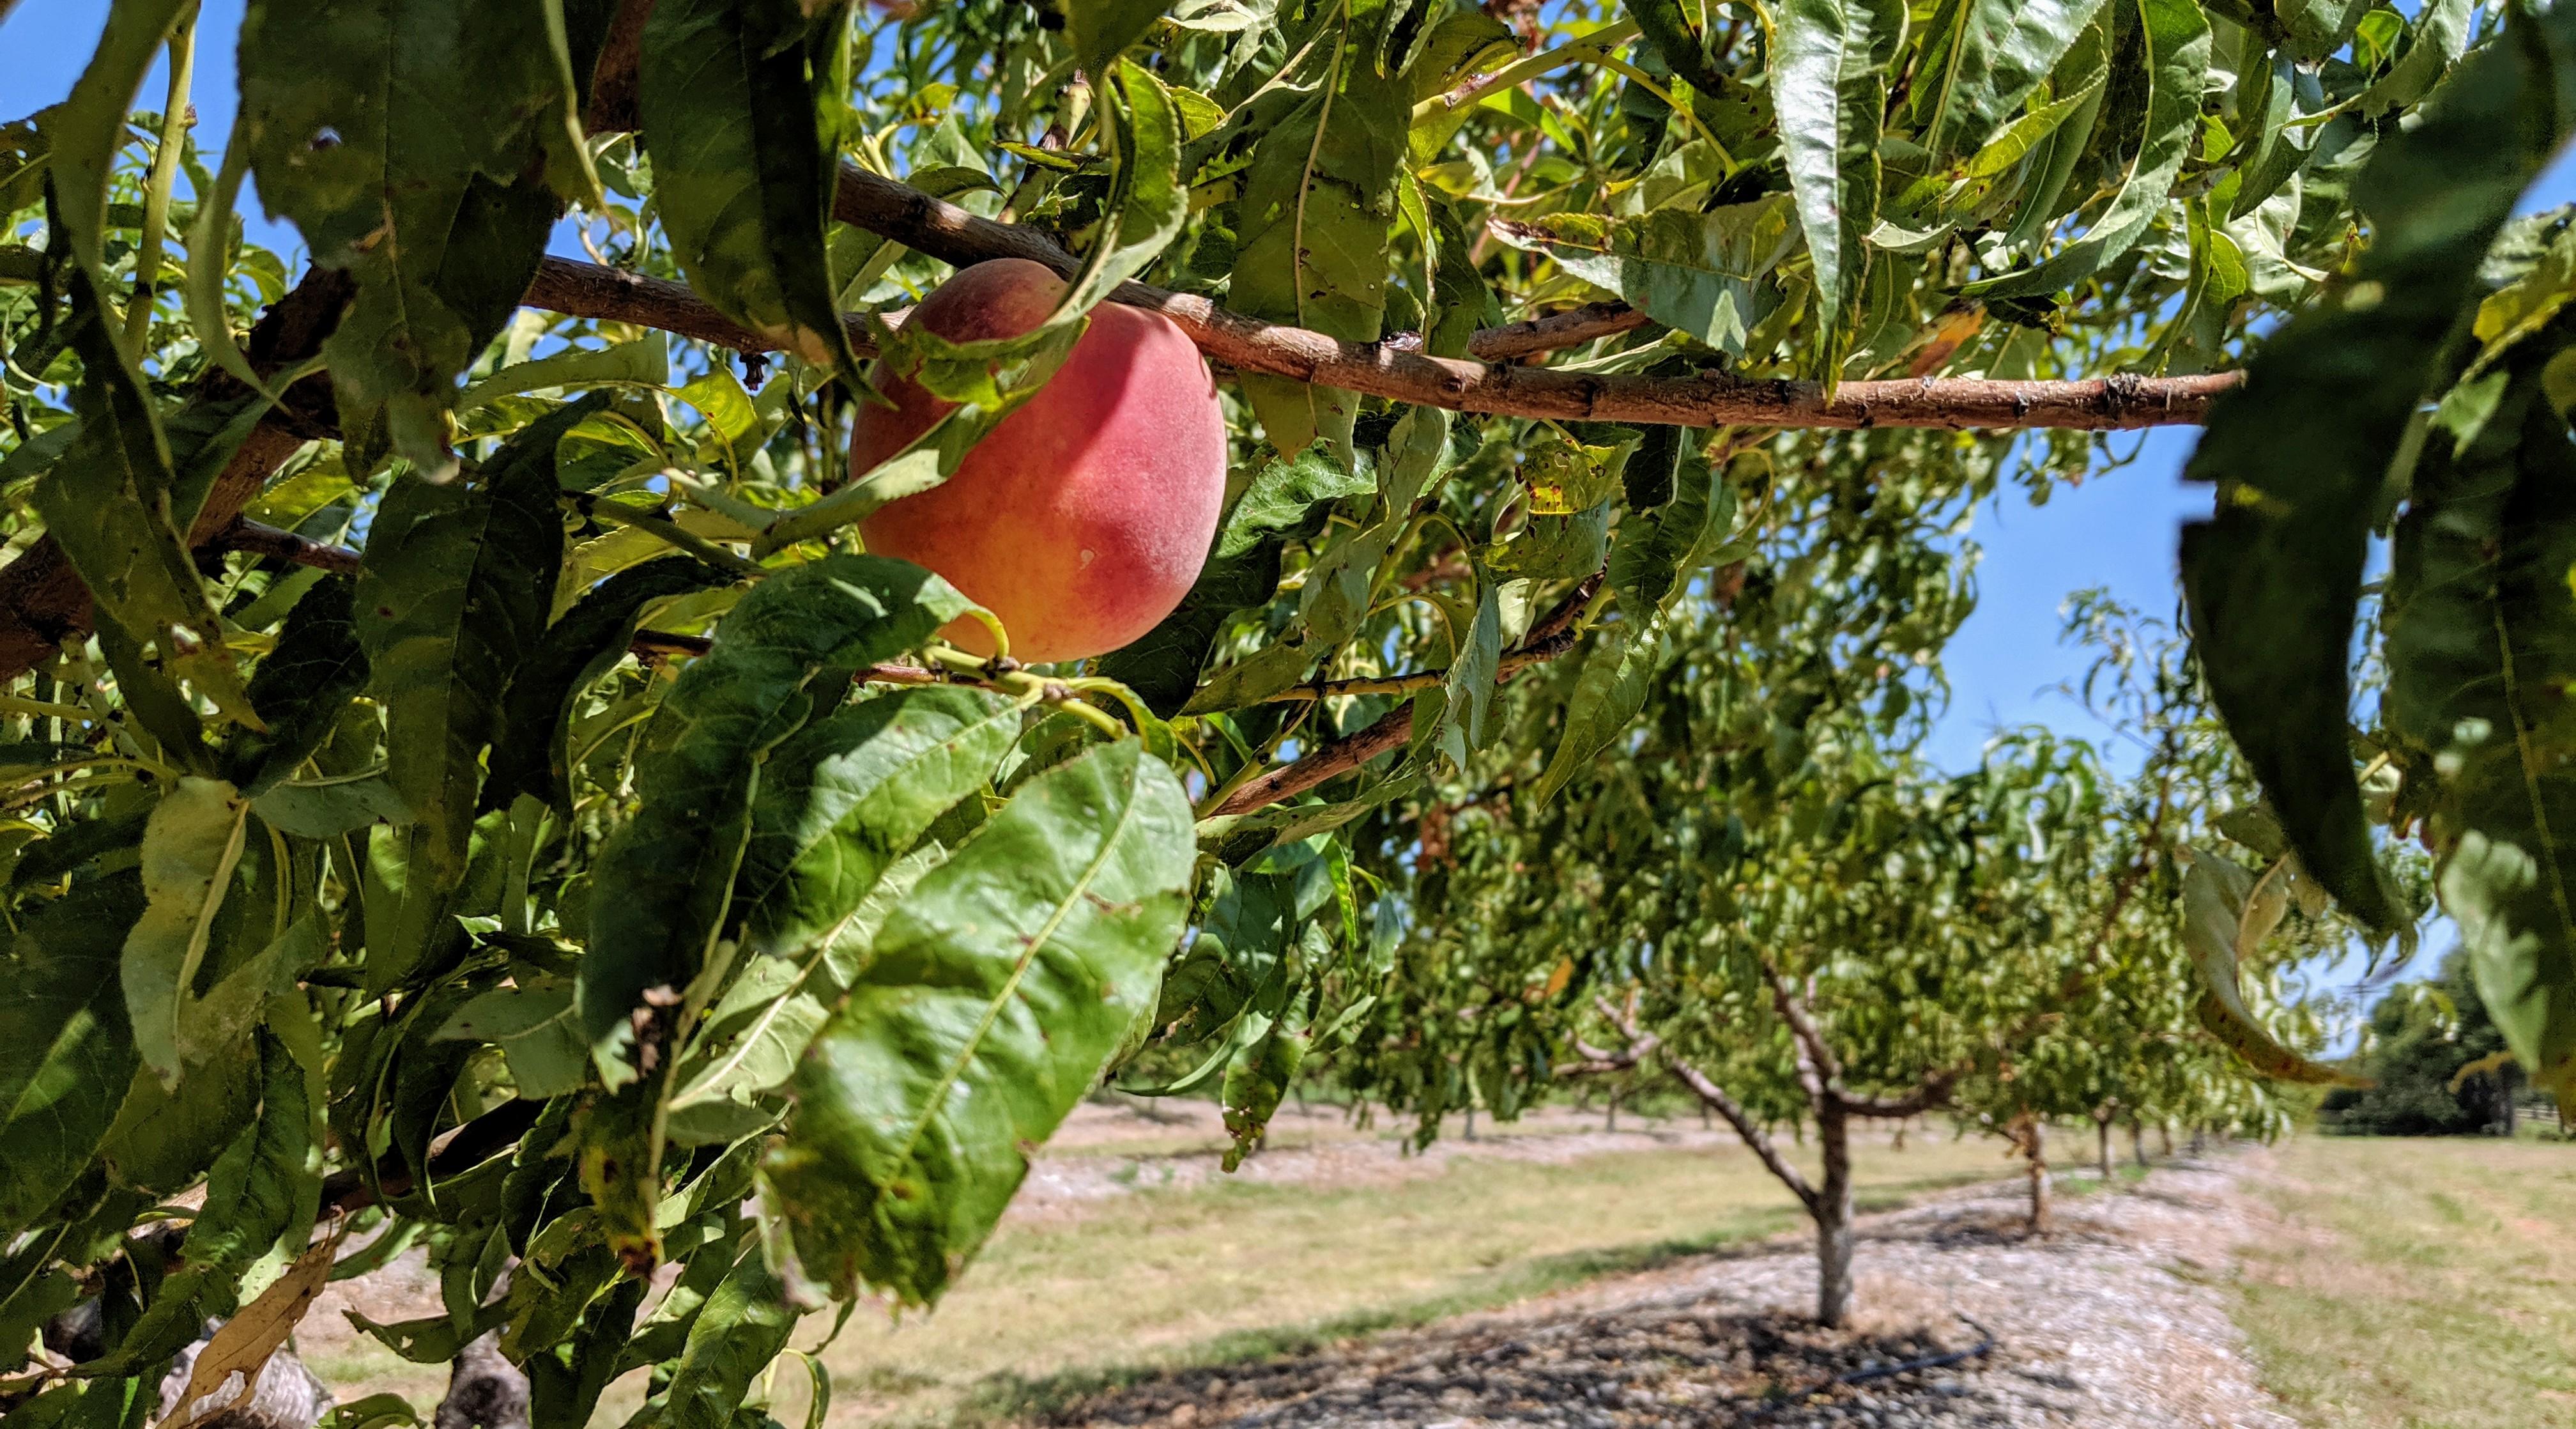 The Last Peach of Summer 2019